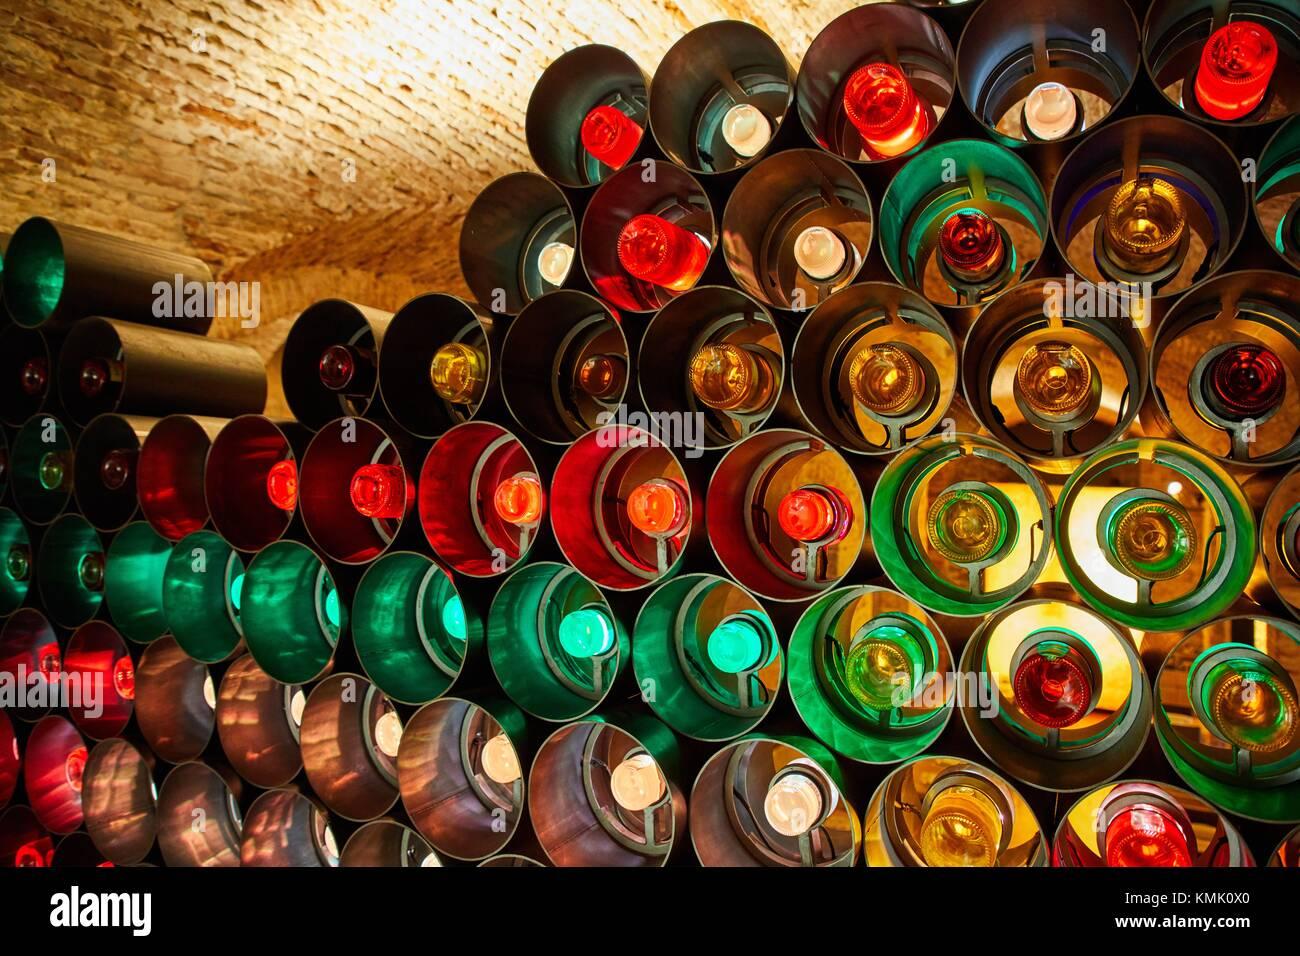 Fabrica de cerveza Moritz, Ronda Sant Antoni, Barcelona, Catalonia, Spain - Stock Image